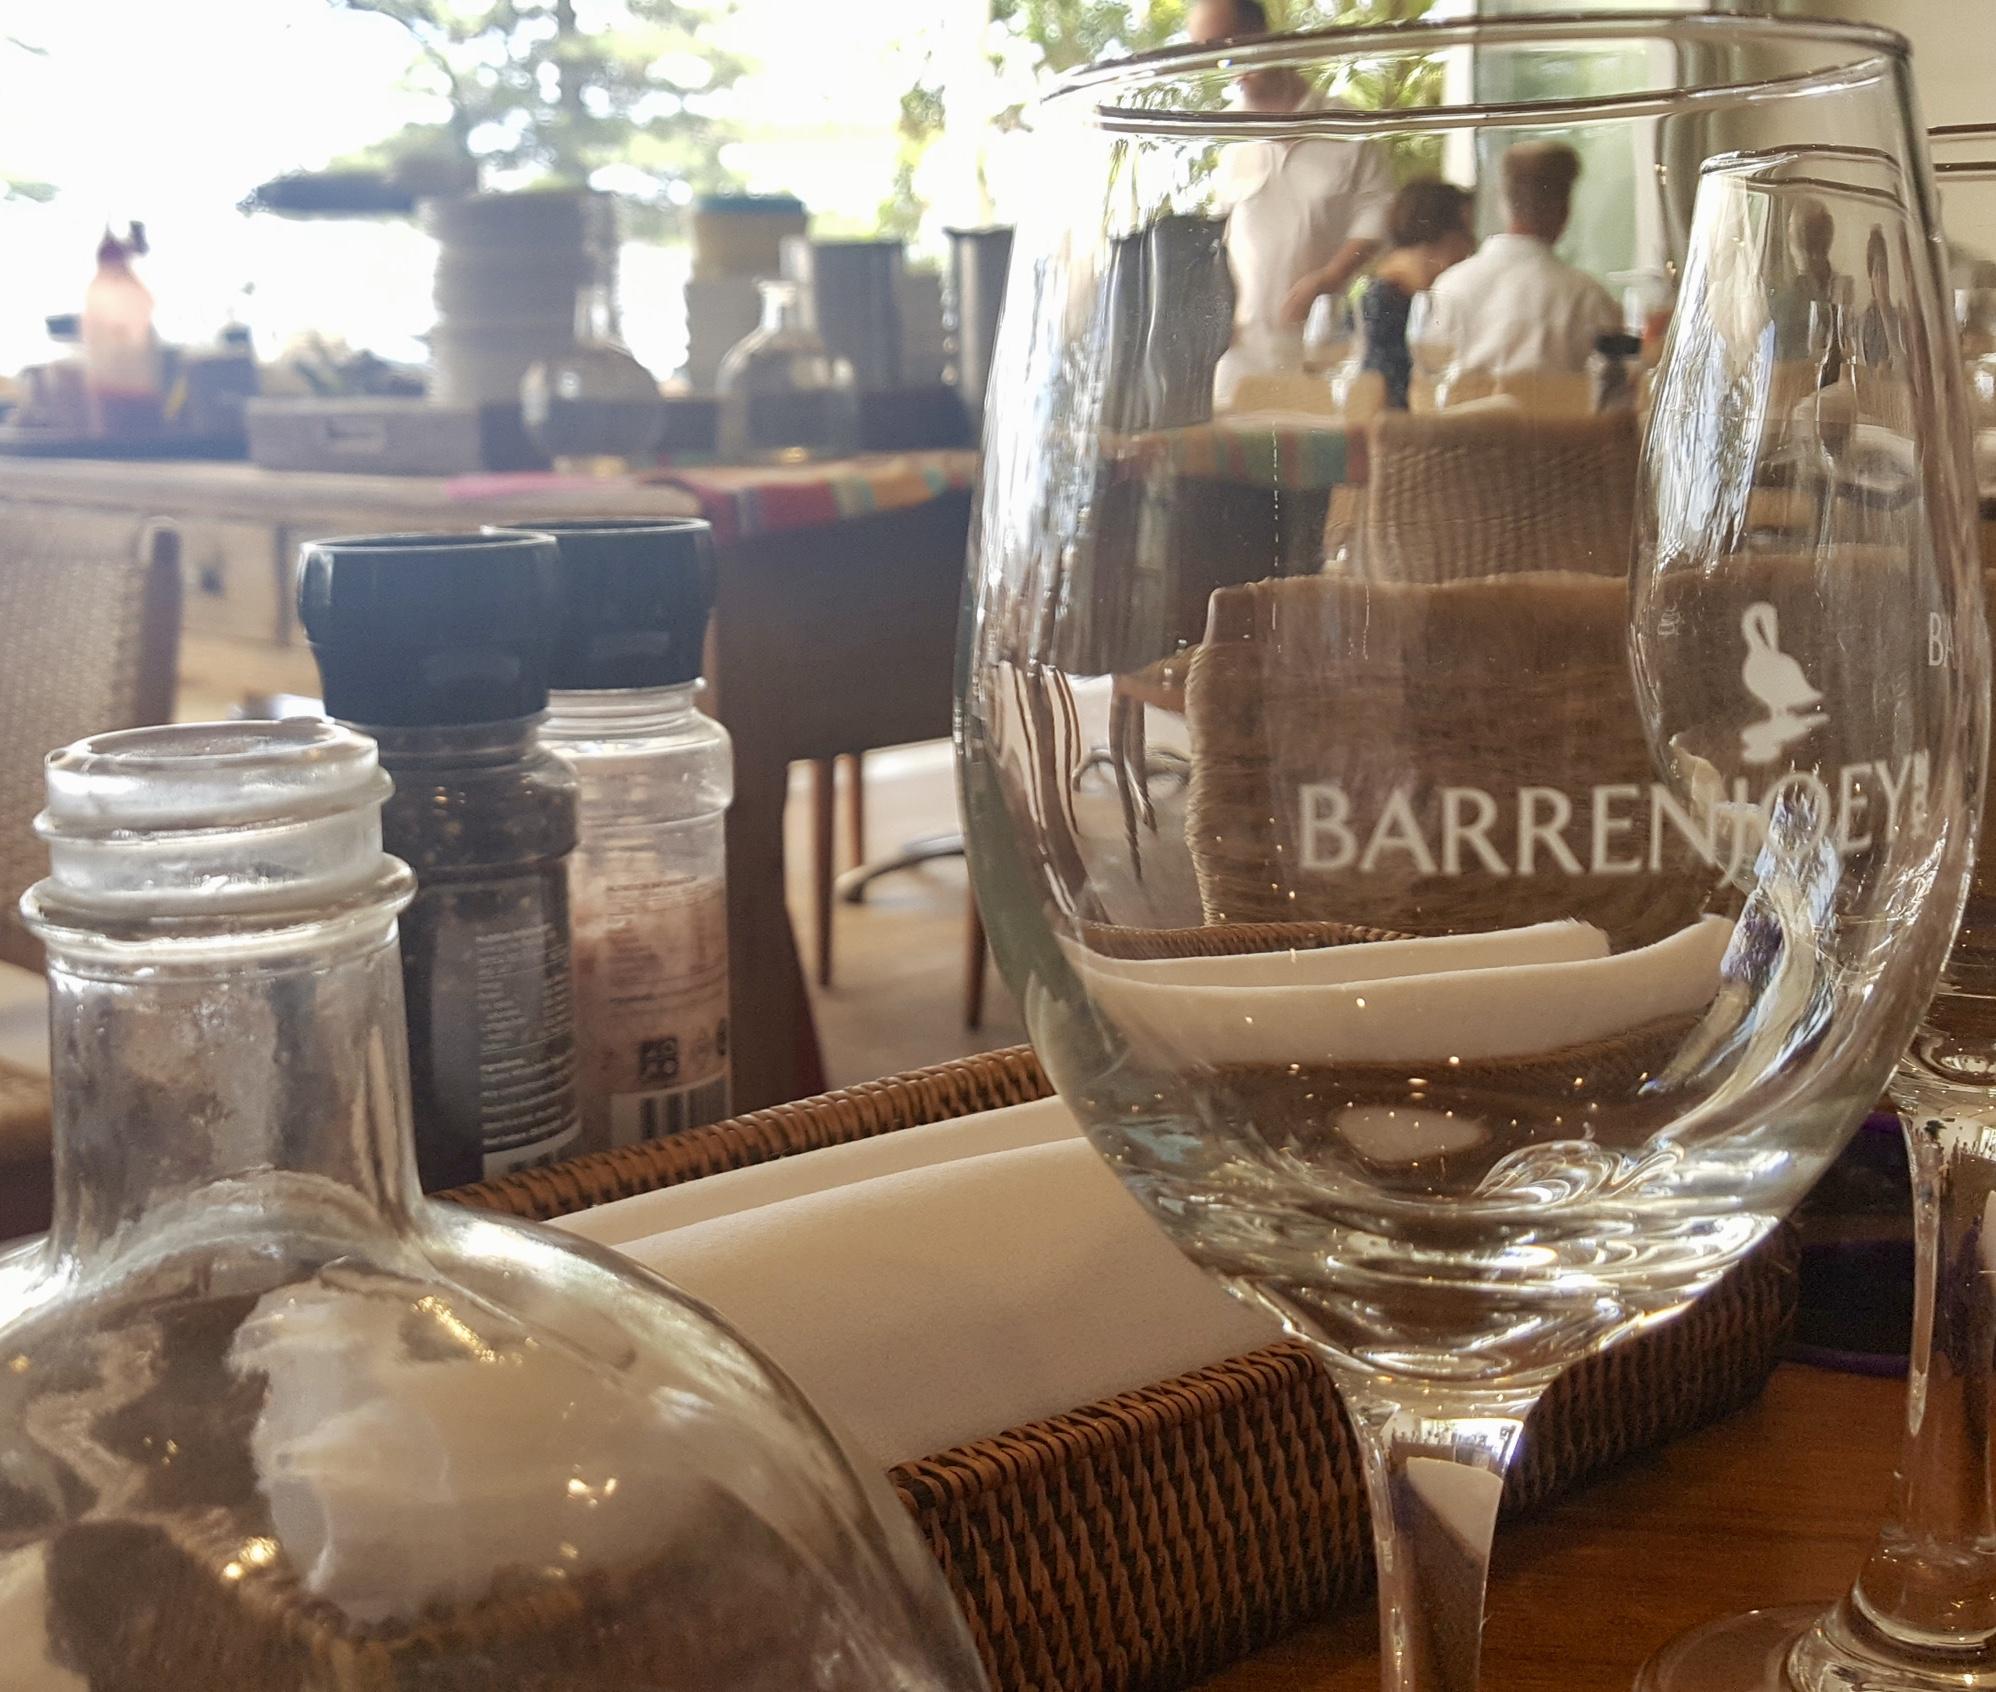 Barrenjoey House, Palm Beach, Sydney, Northern Beaches